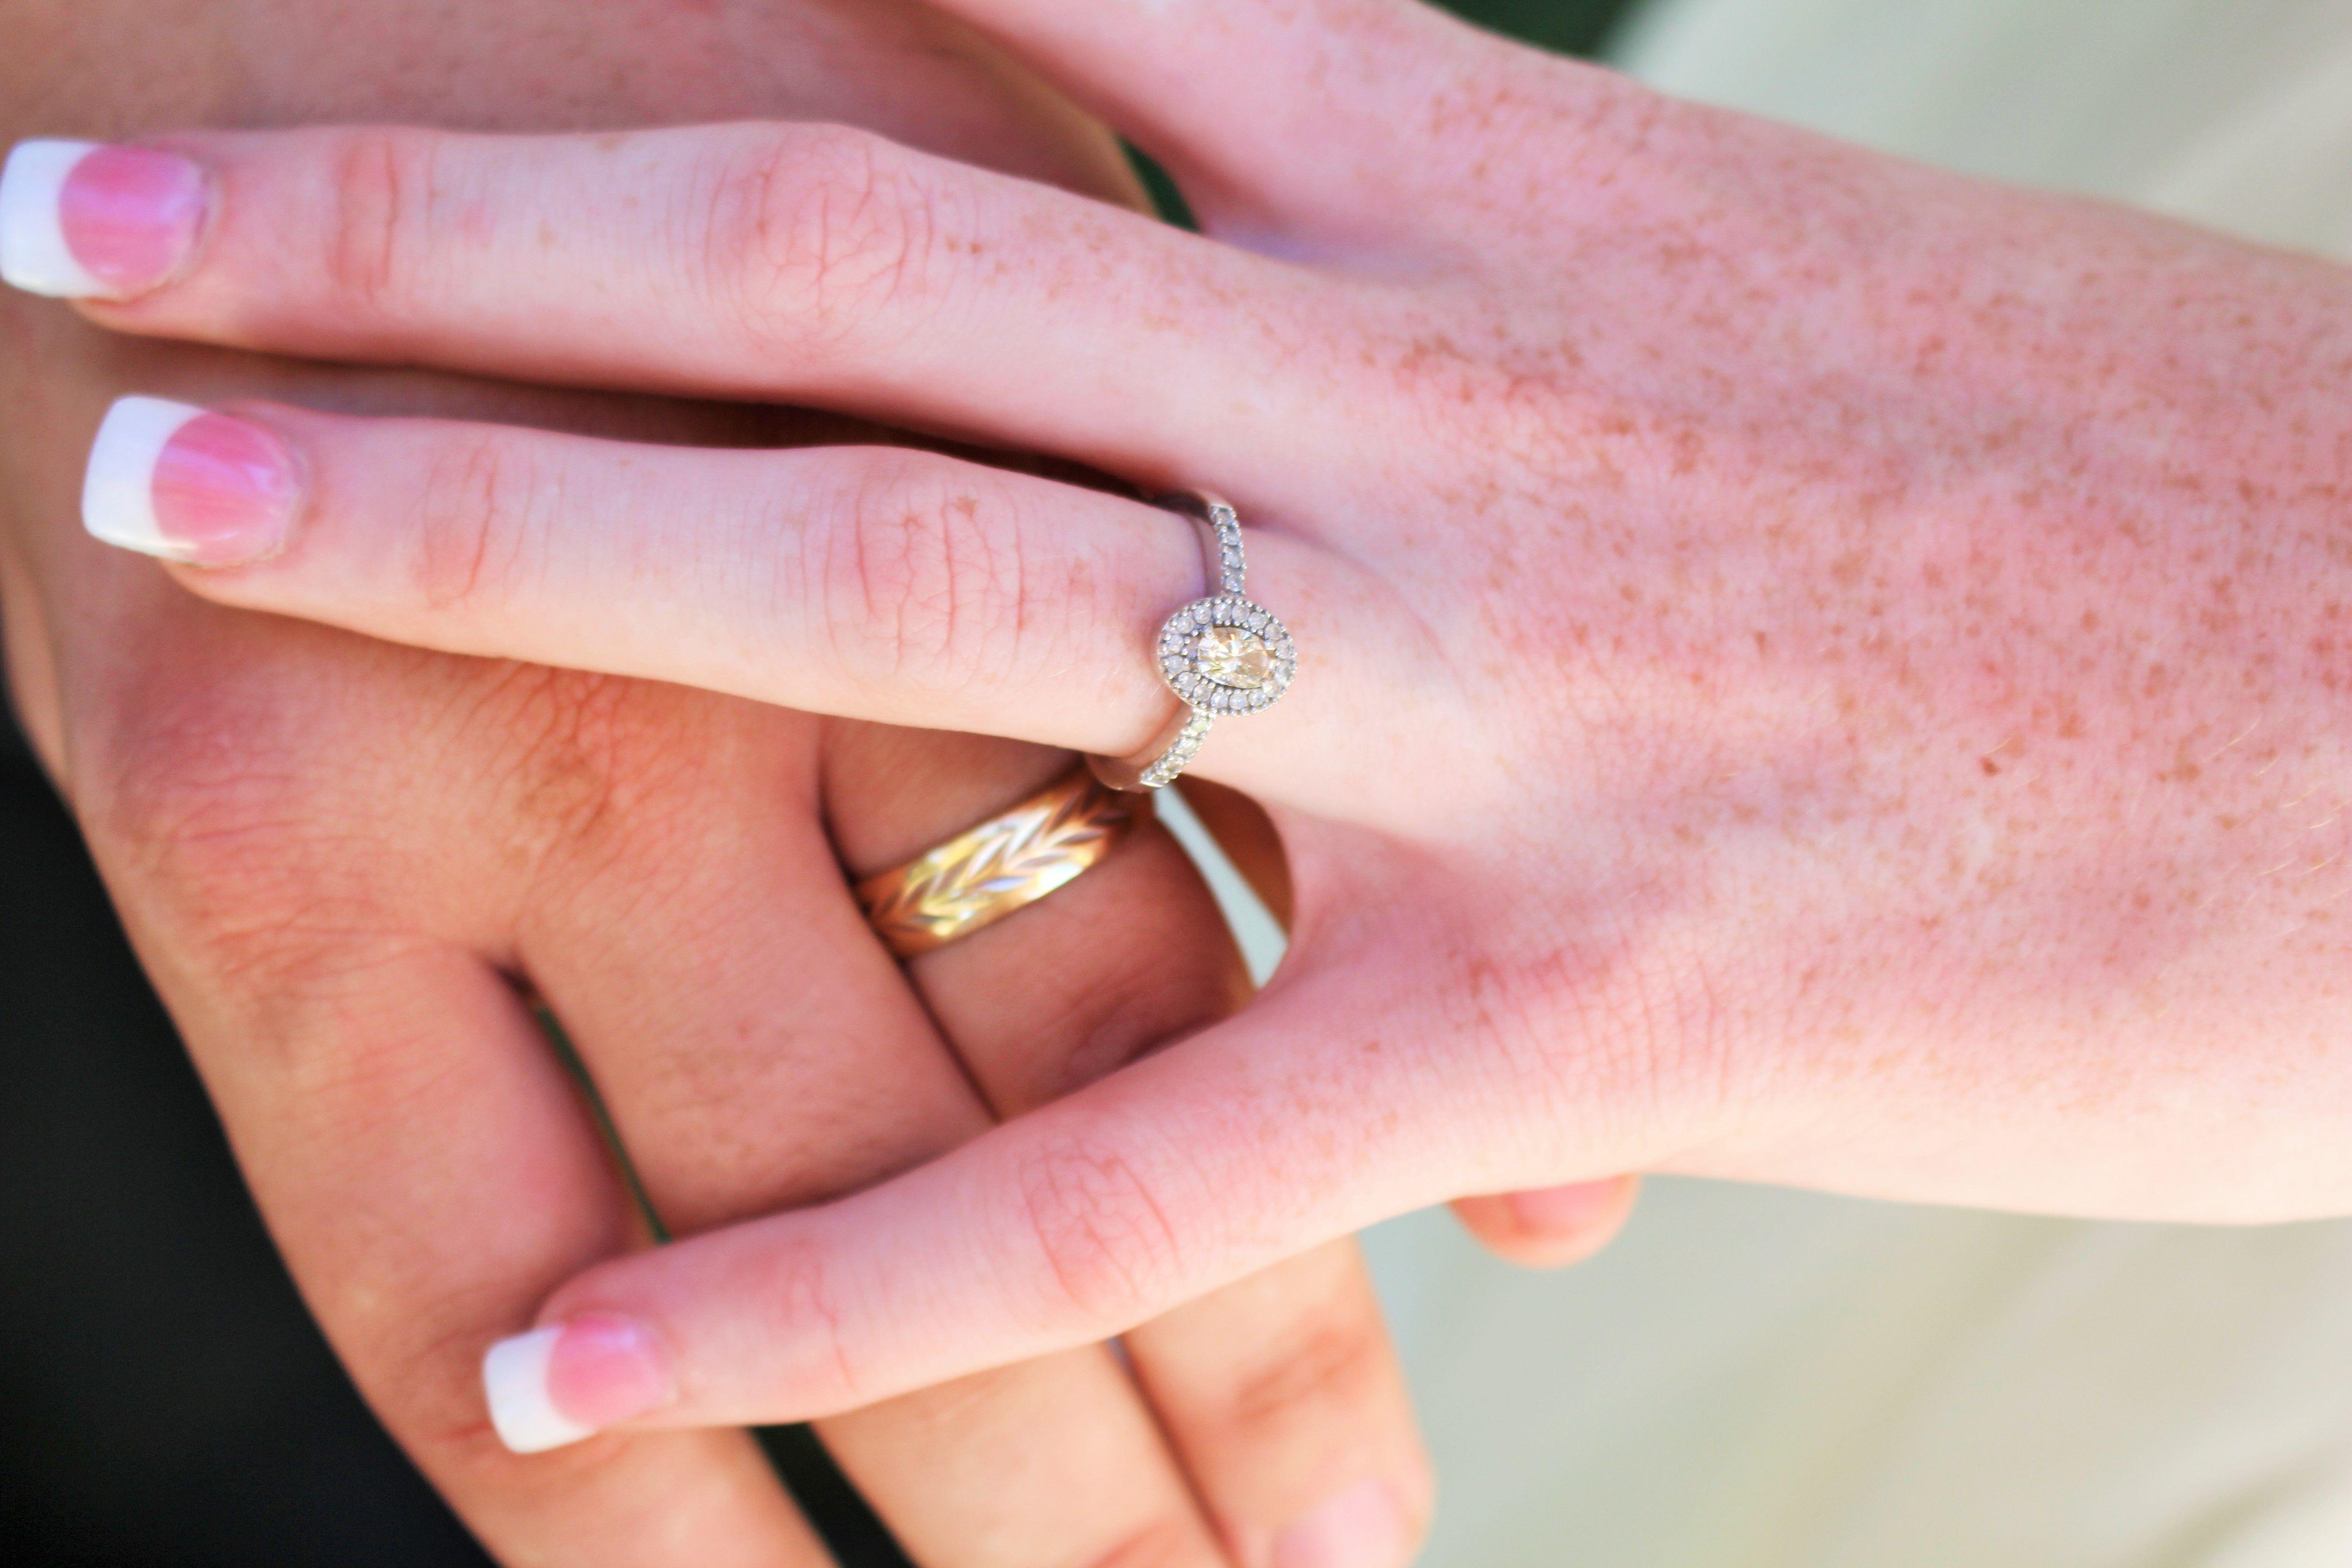 Yep, loving my ring. #rings #oval #wedding #photography #bride ...